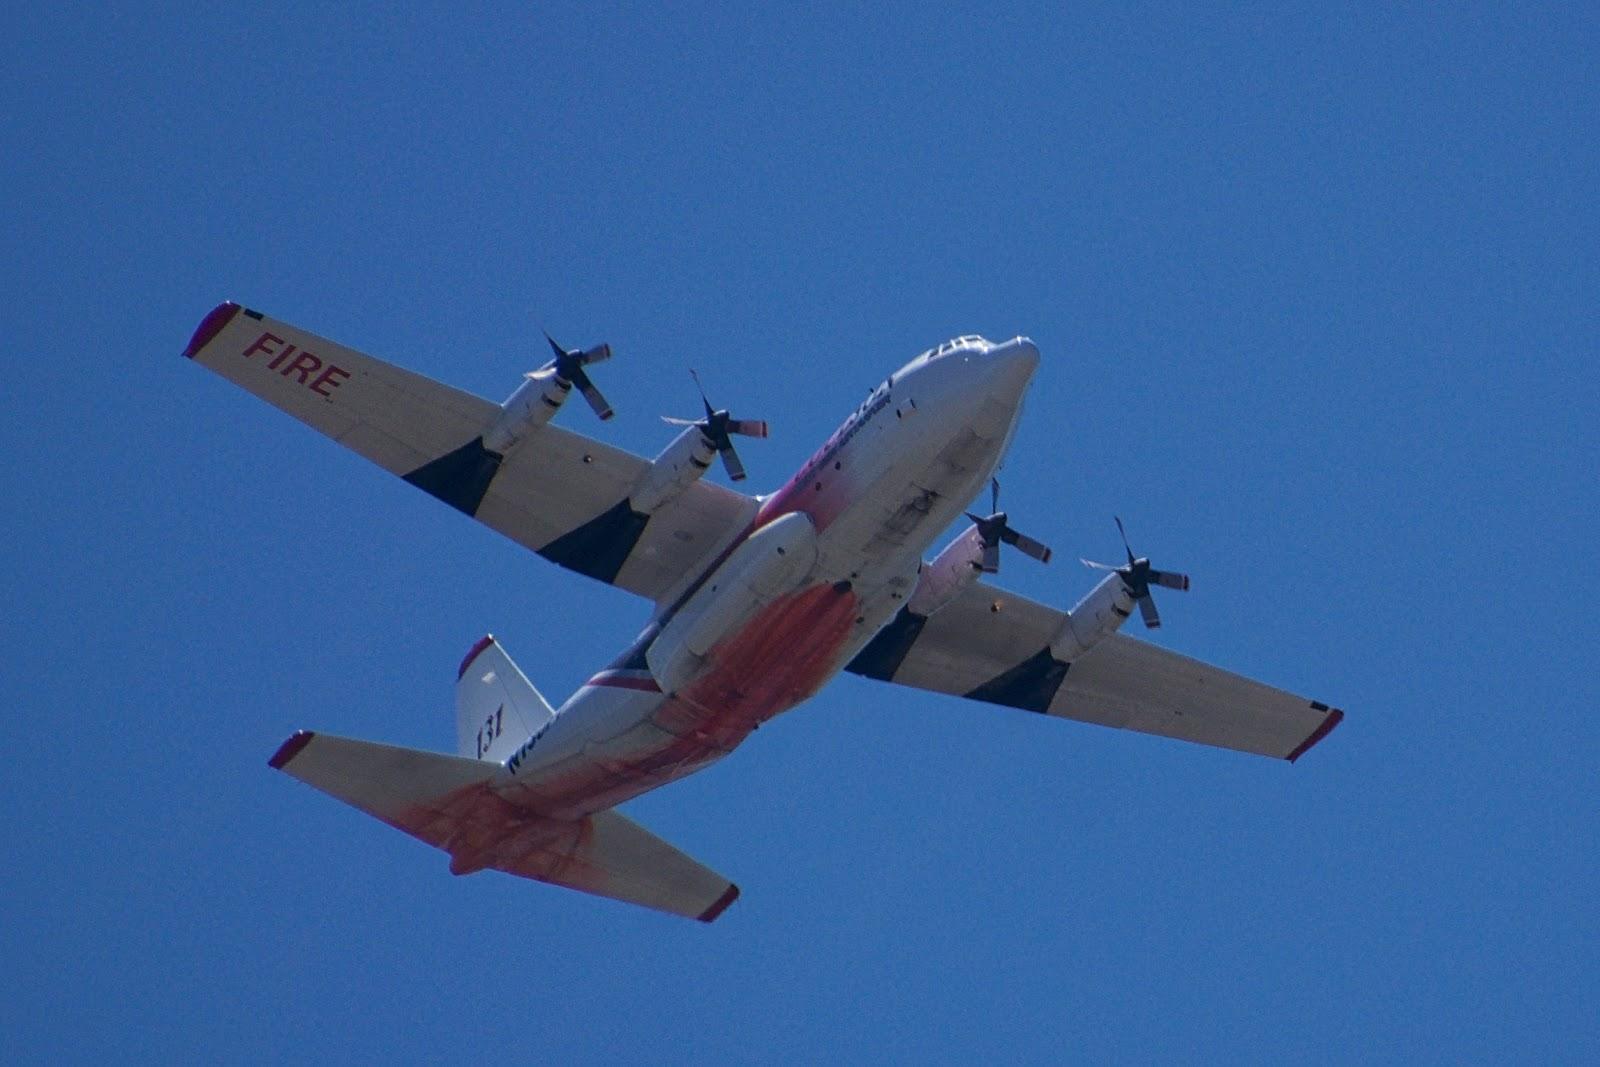 Fire Plane 3.jpeg